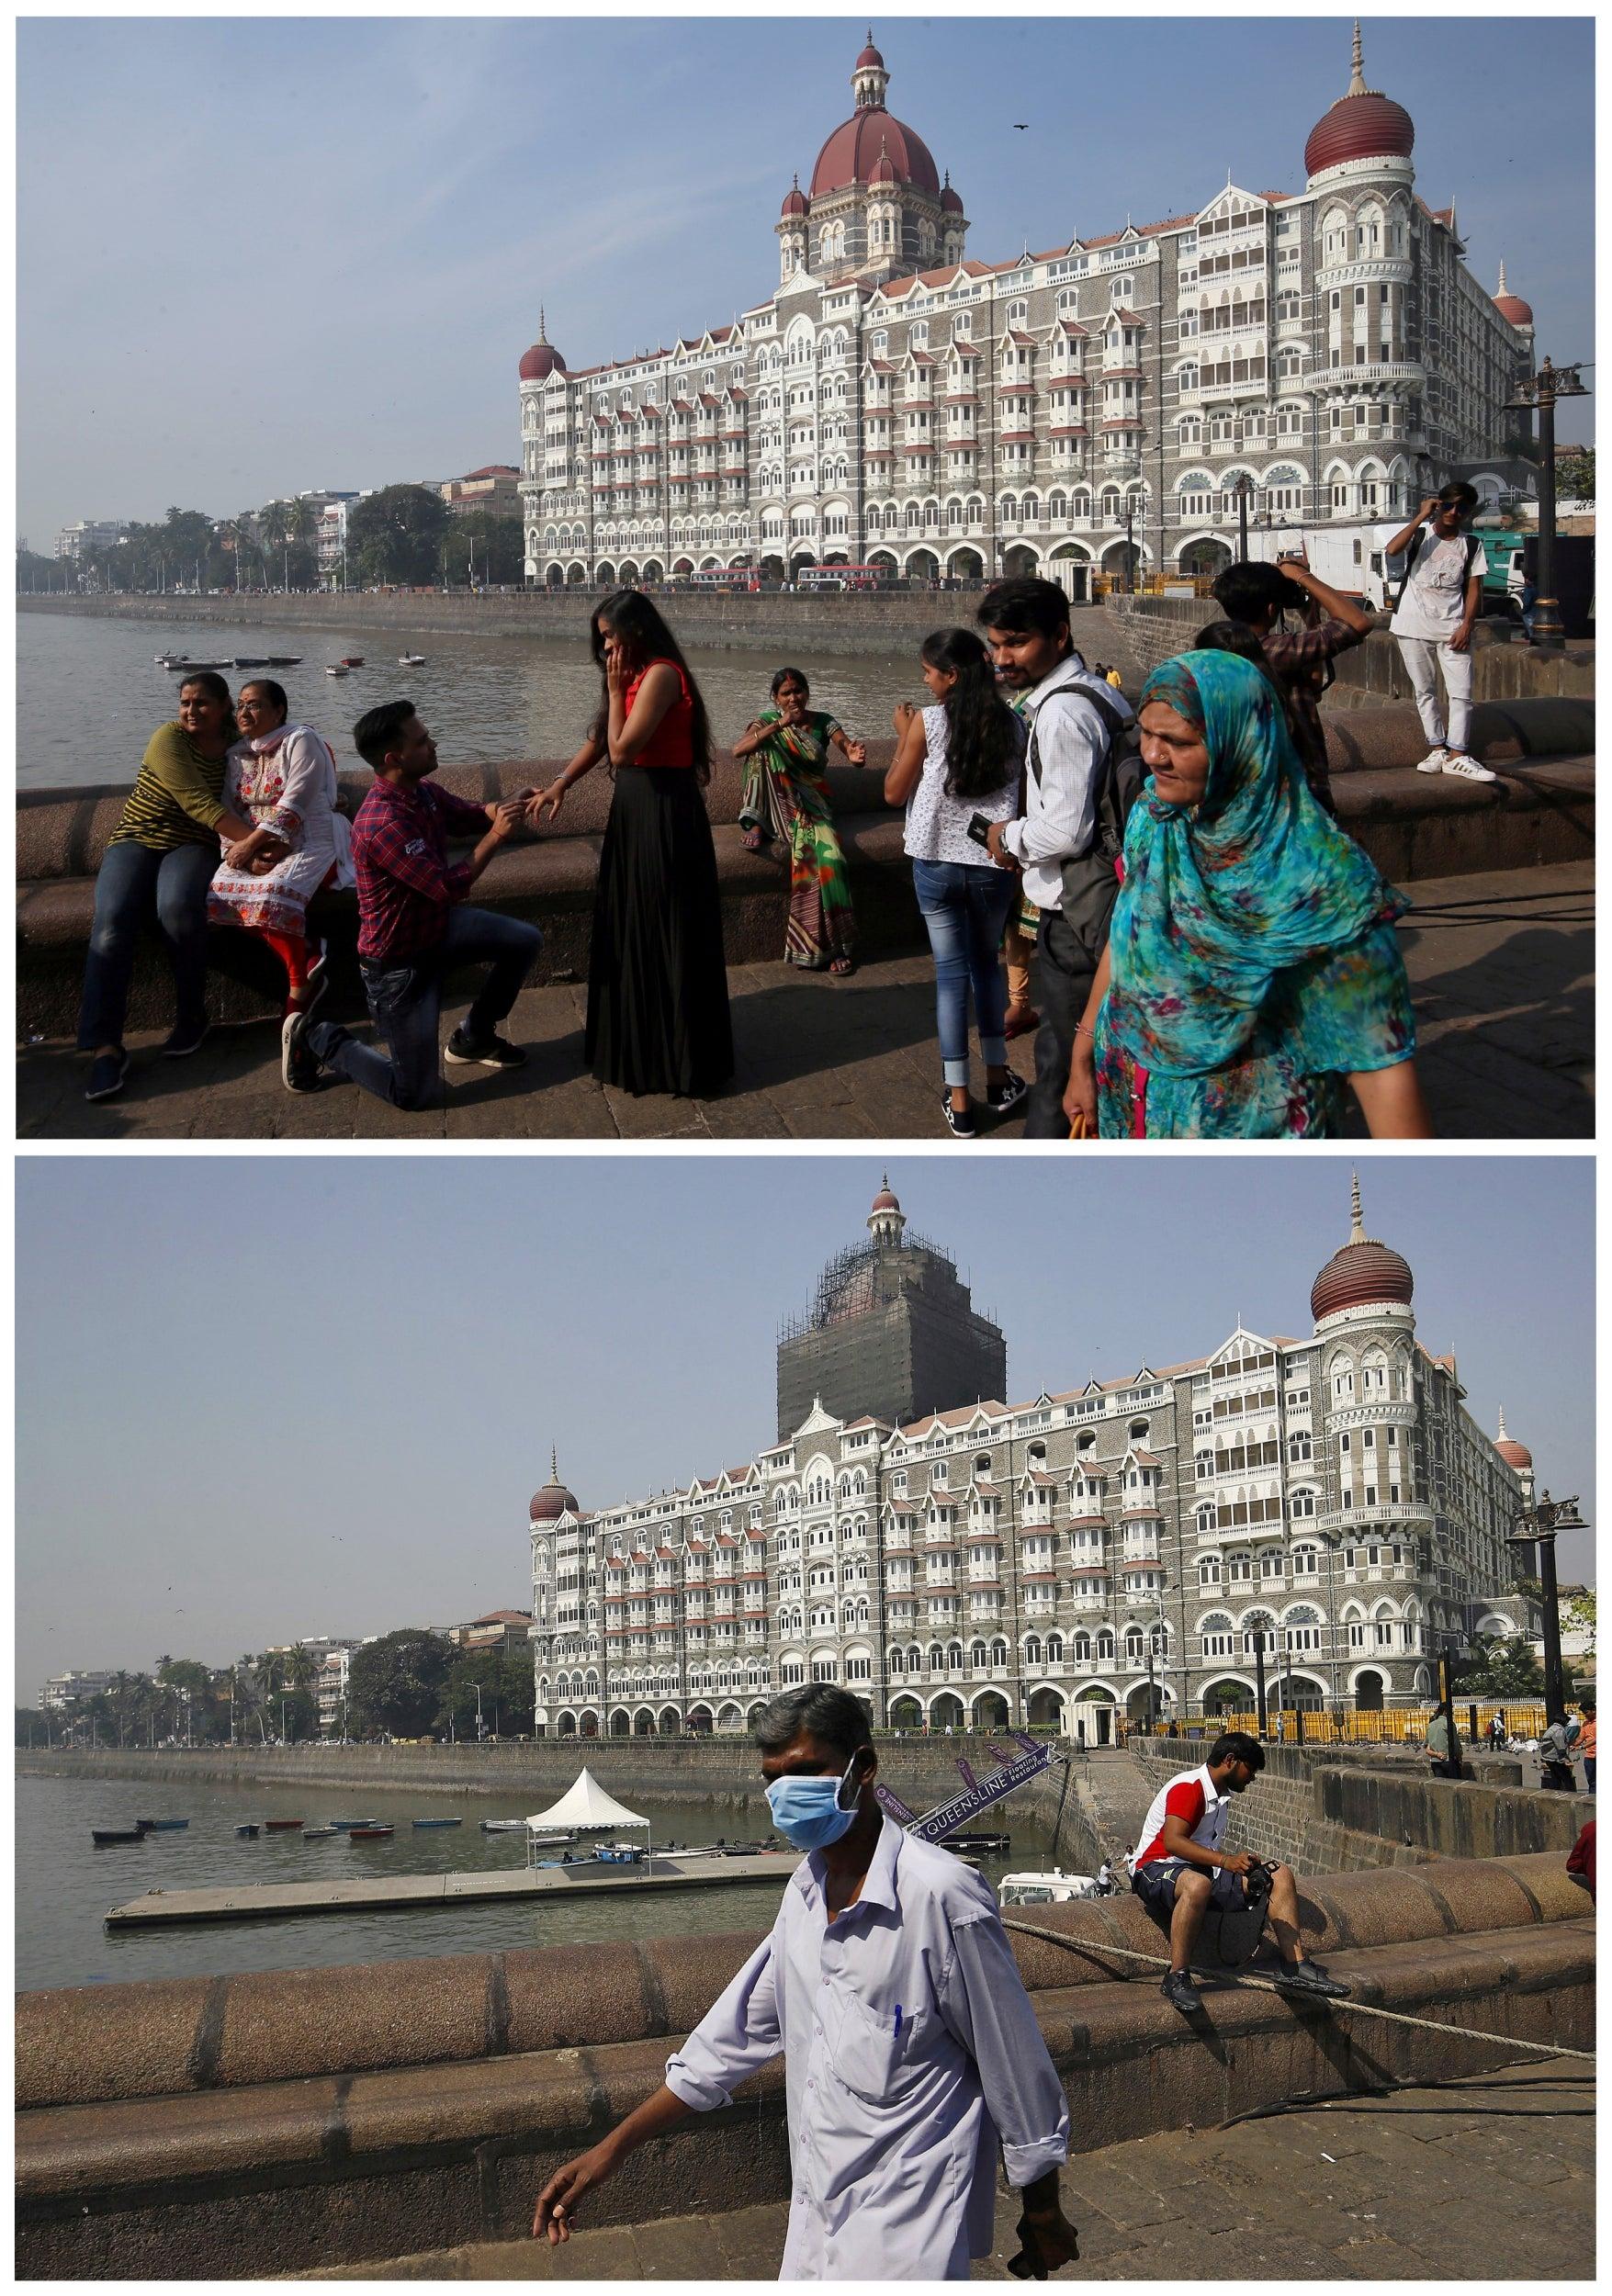 Taj Mahal hotel, India